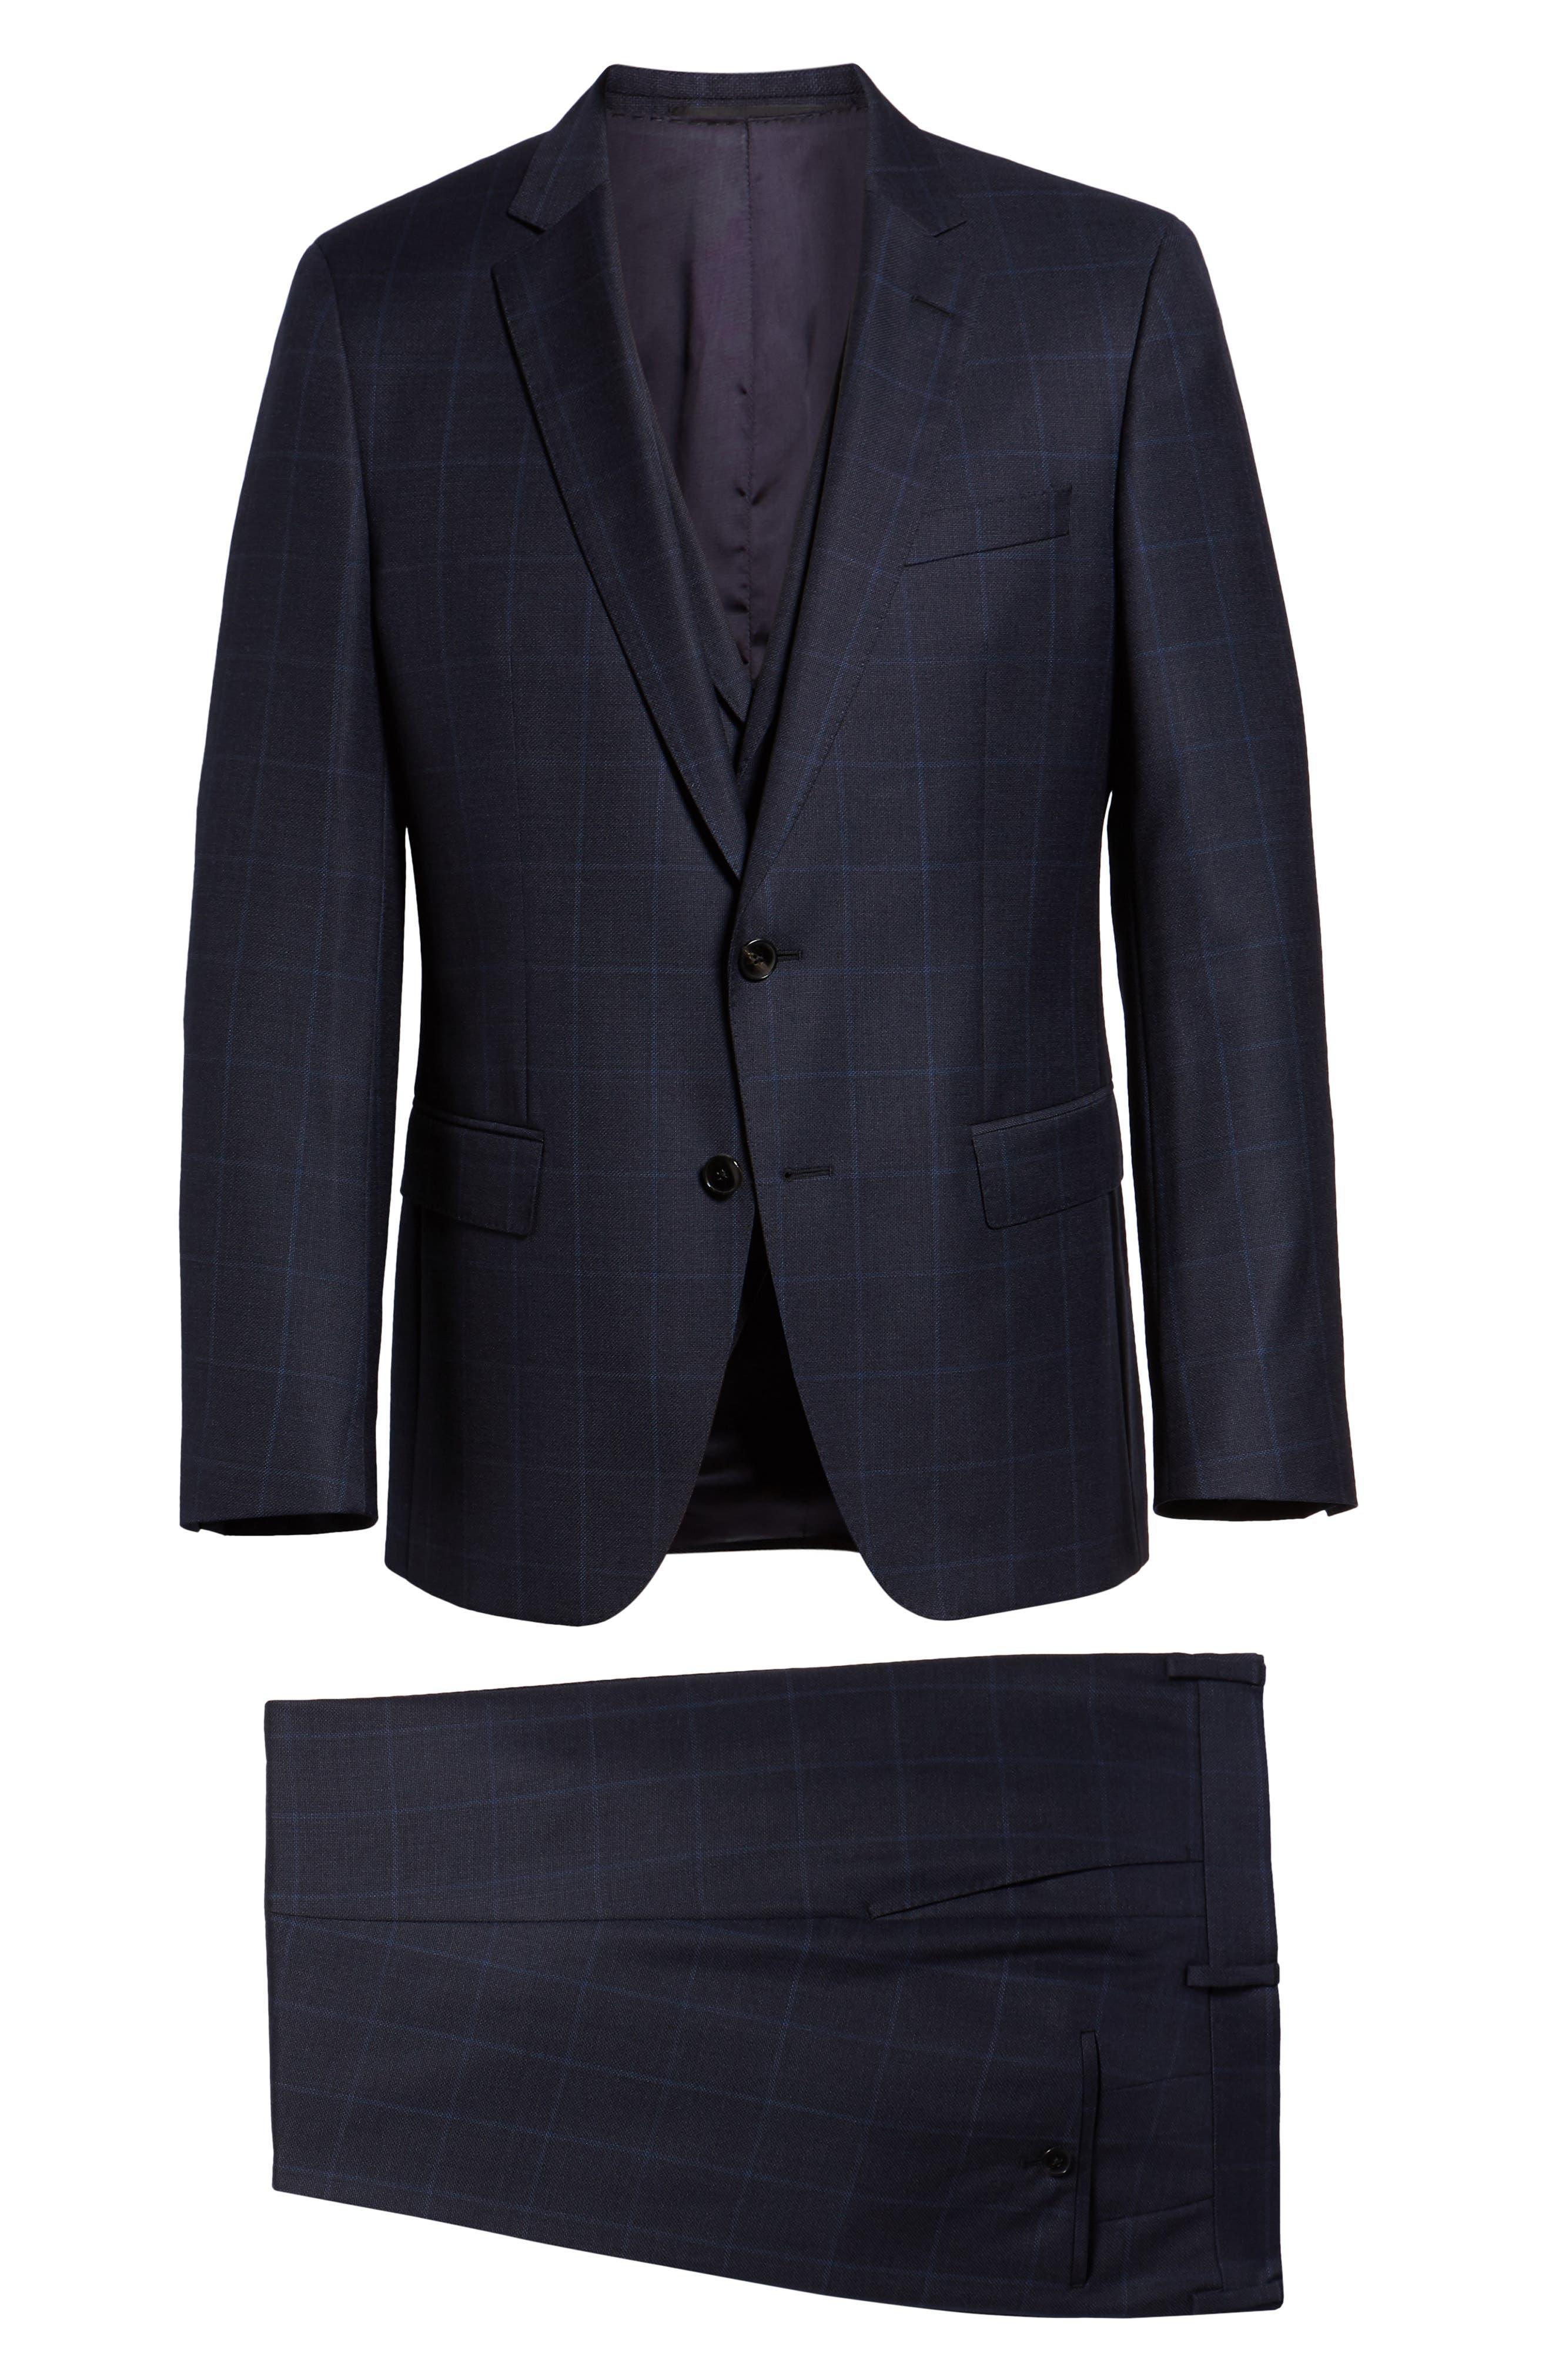 Huge/Genius Trim Fit Windowpane Wool Three-Piece Suit,                             Alternate thumbnail 9, color,                             480